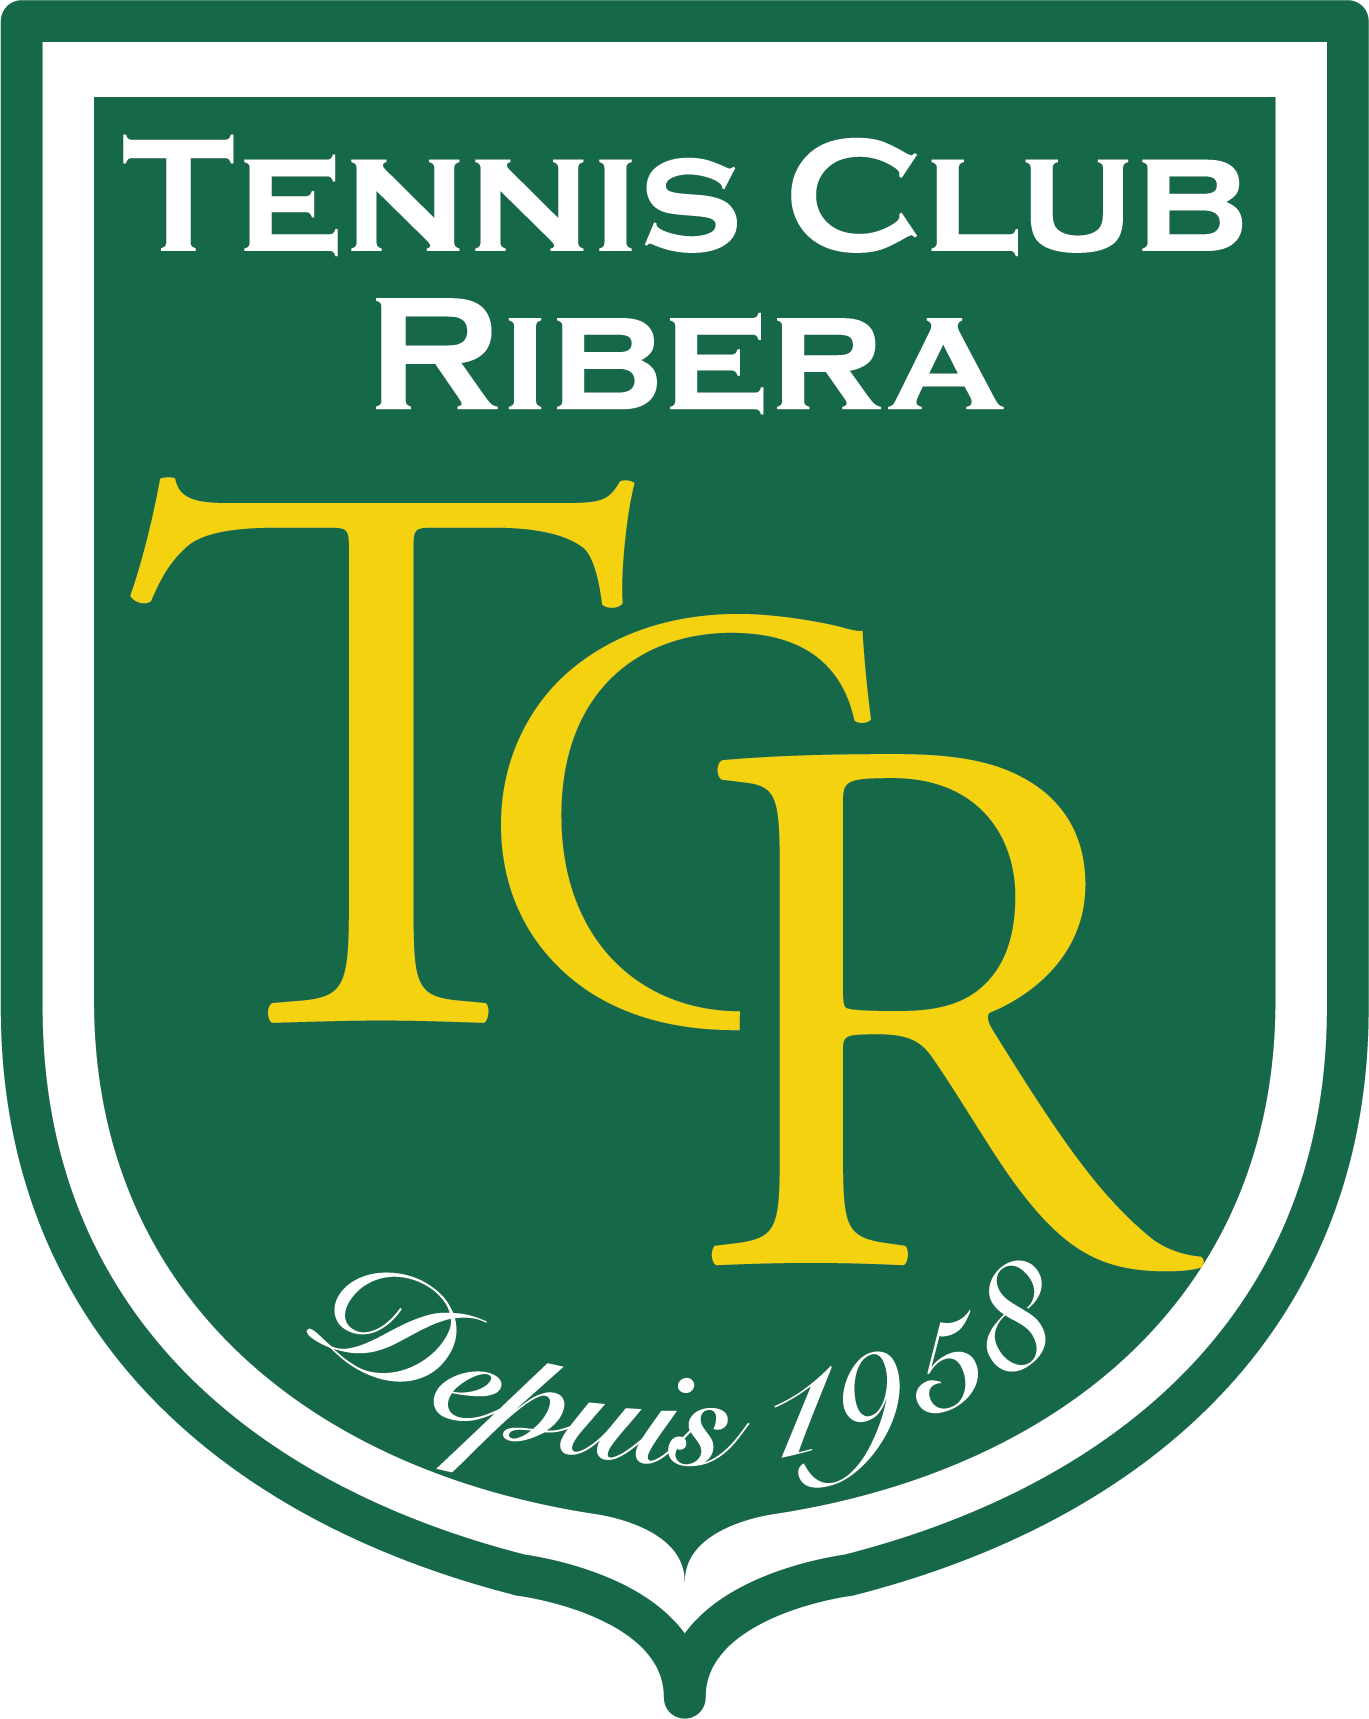 Tennis ribera court couvert paris 16